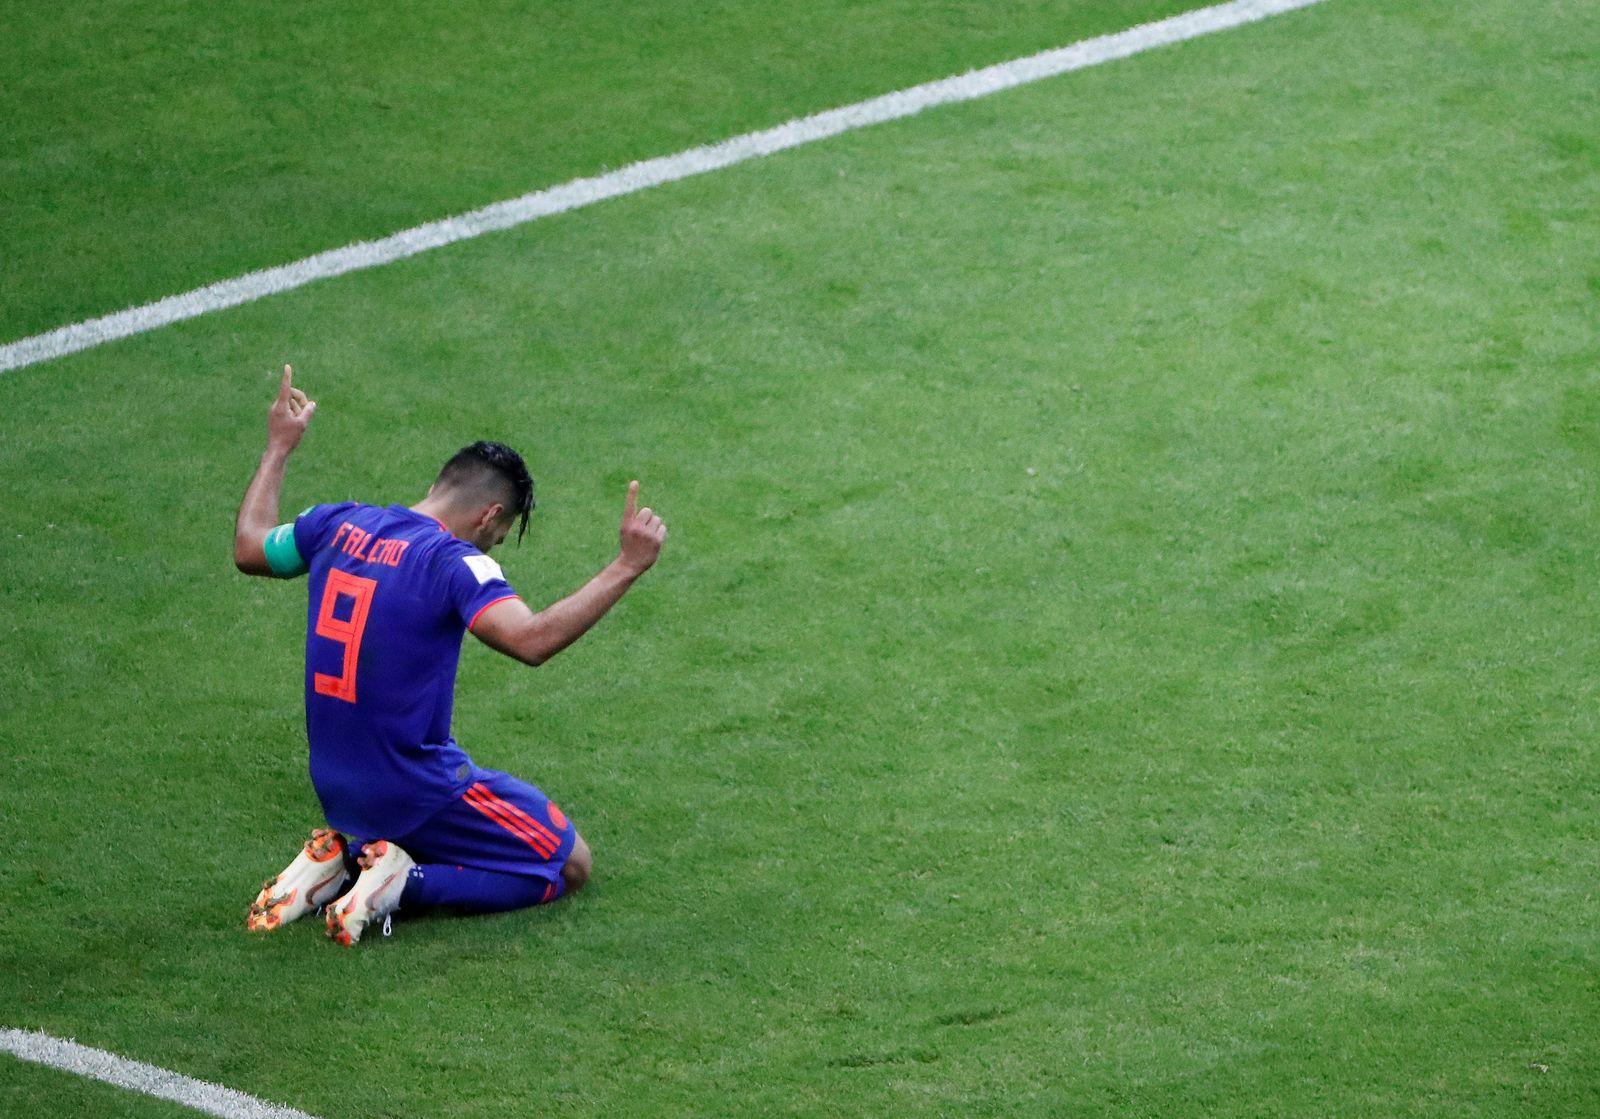 SOCCER-WORLDCUP-POL-COL/